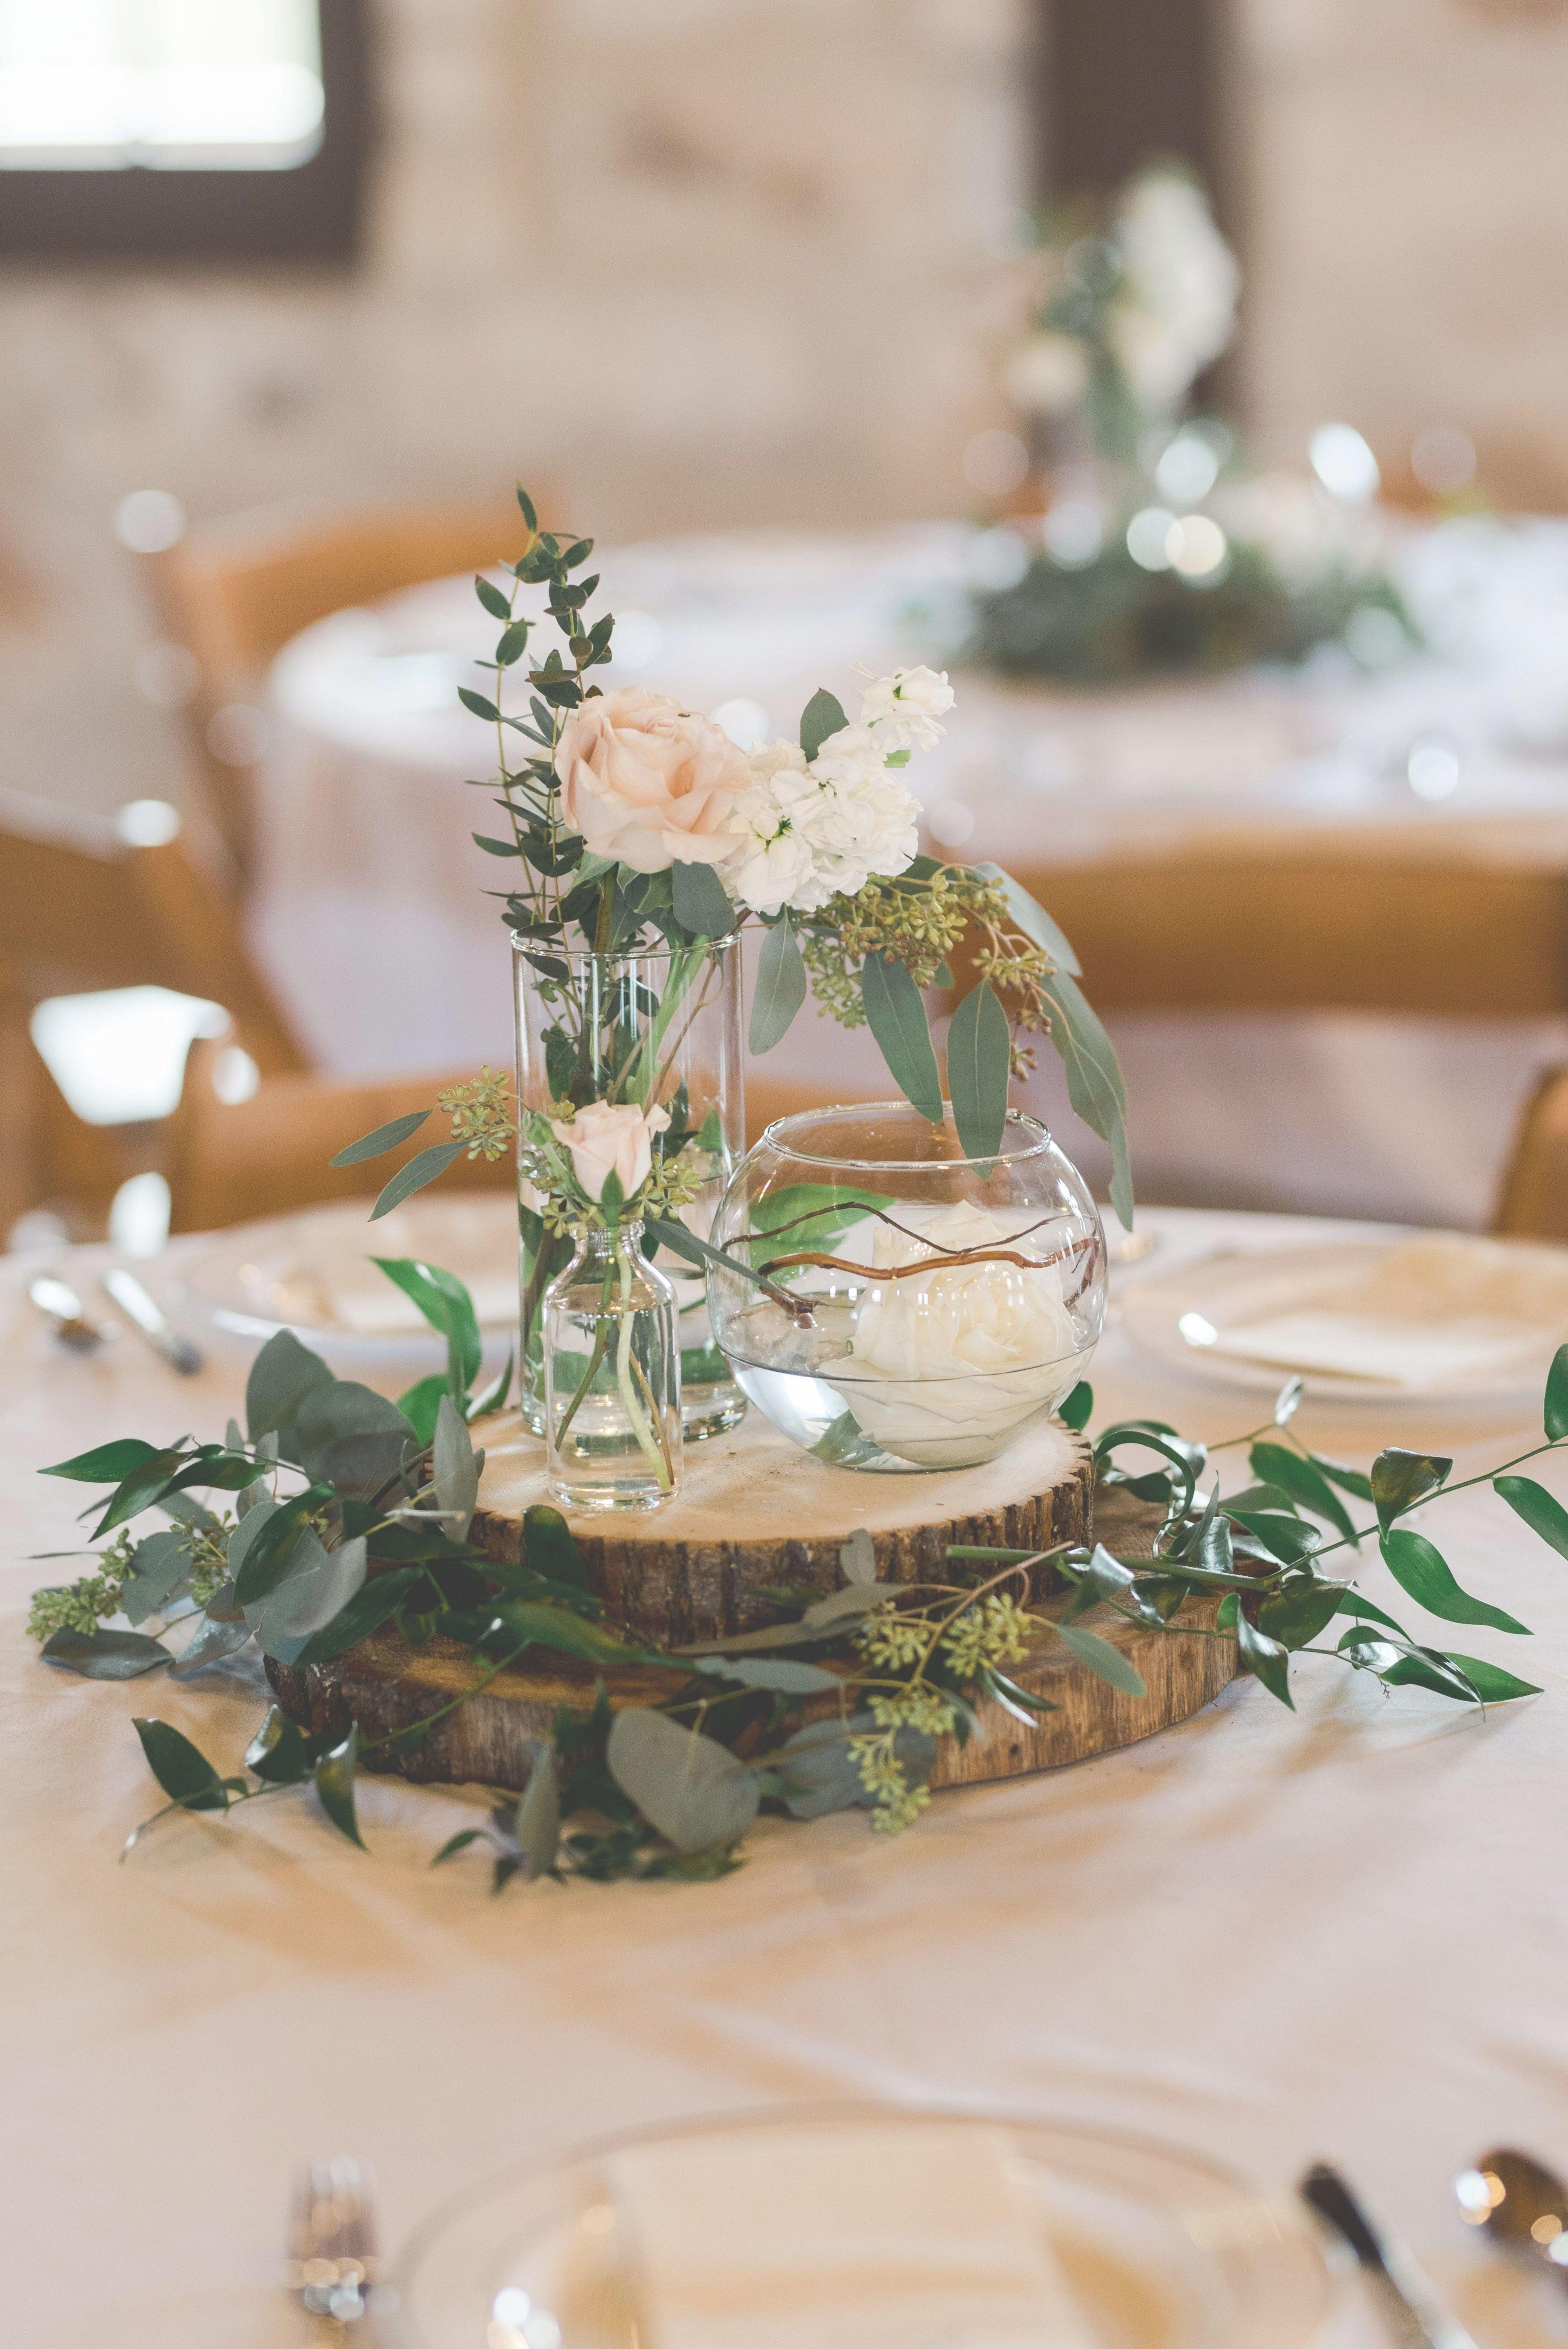 Boho Chic Wedding Centerpiece Modern Rustic Wedding Centerpiece Sou Pink Wedding Centerpieces Blush Pink Wedding Centerpieces Spring Wedding Centerpieces